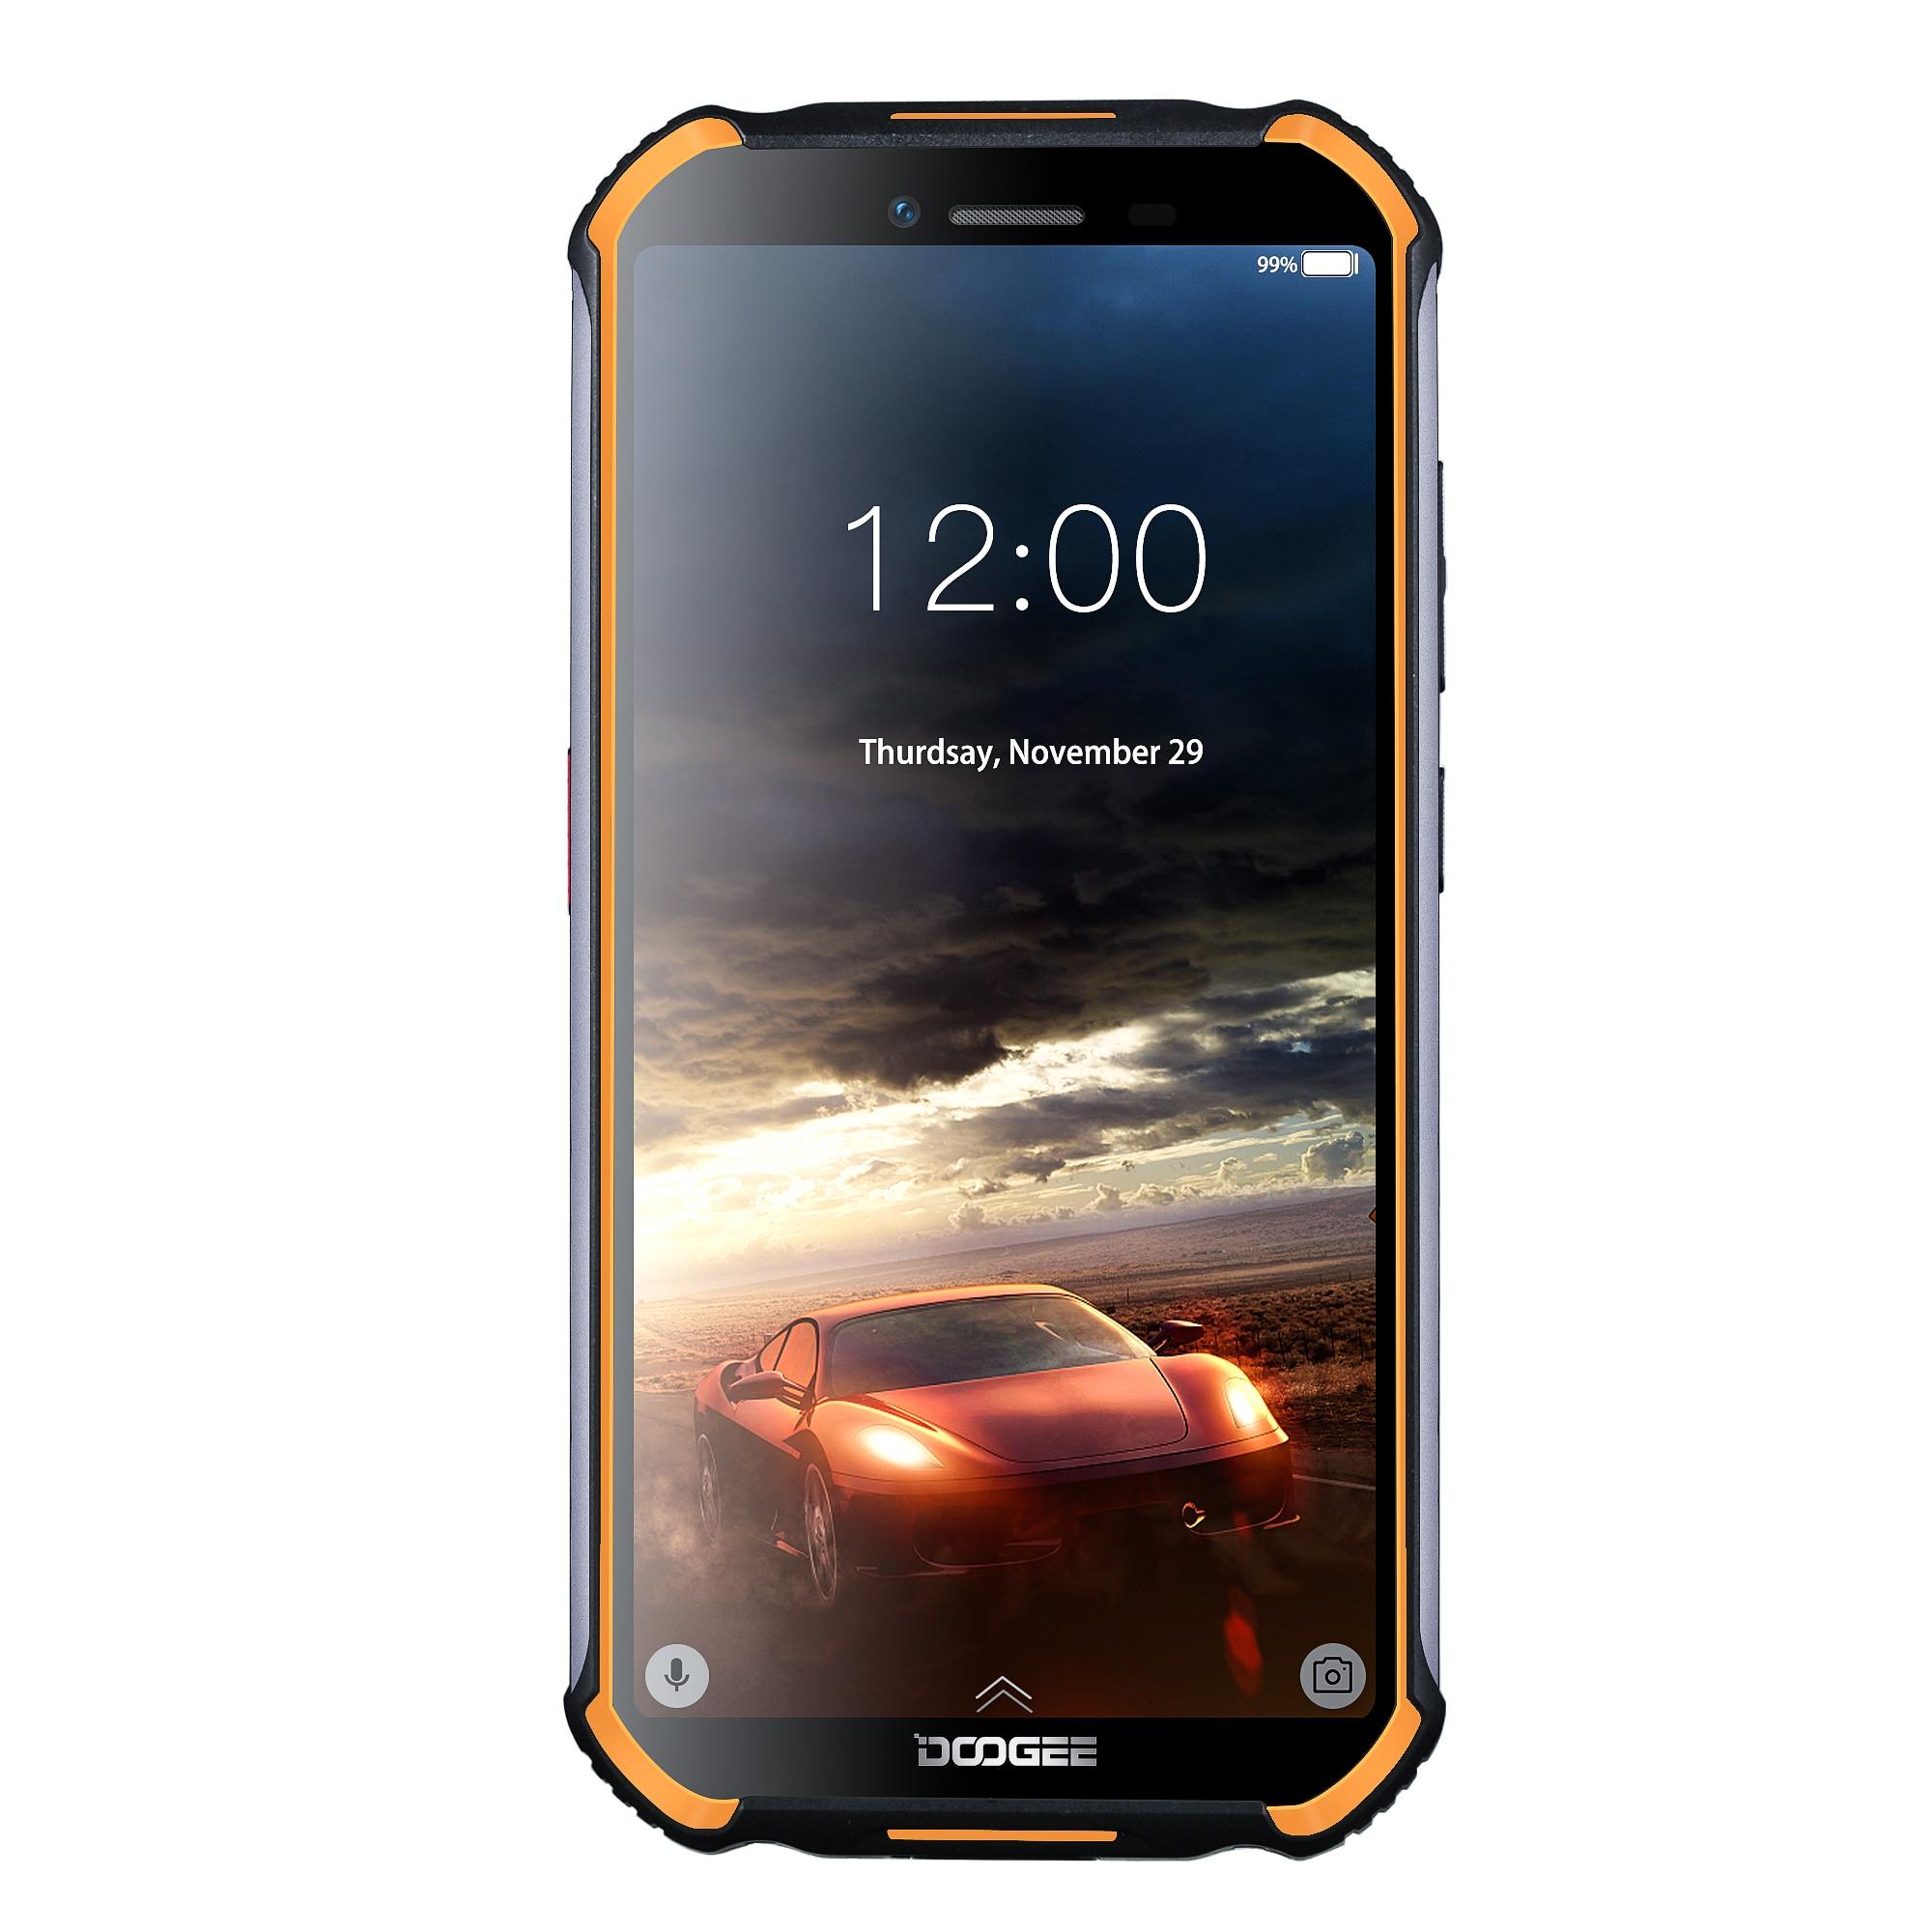 DOOGEE S40 الروبوت 9.0 4G شبكة هاتف محمول وعر 5.5 بوصة هاتف محمول MT6739 رباعية النواة 3GB RAM 32GB ROM 8.0MP IP68/IP69K